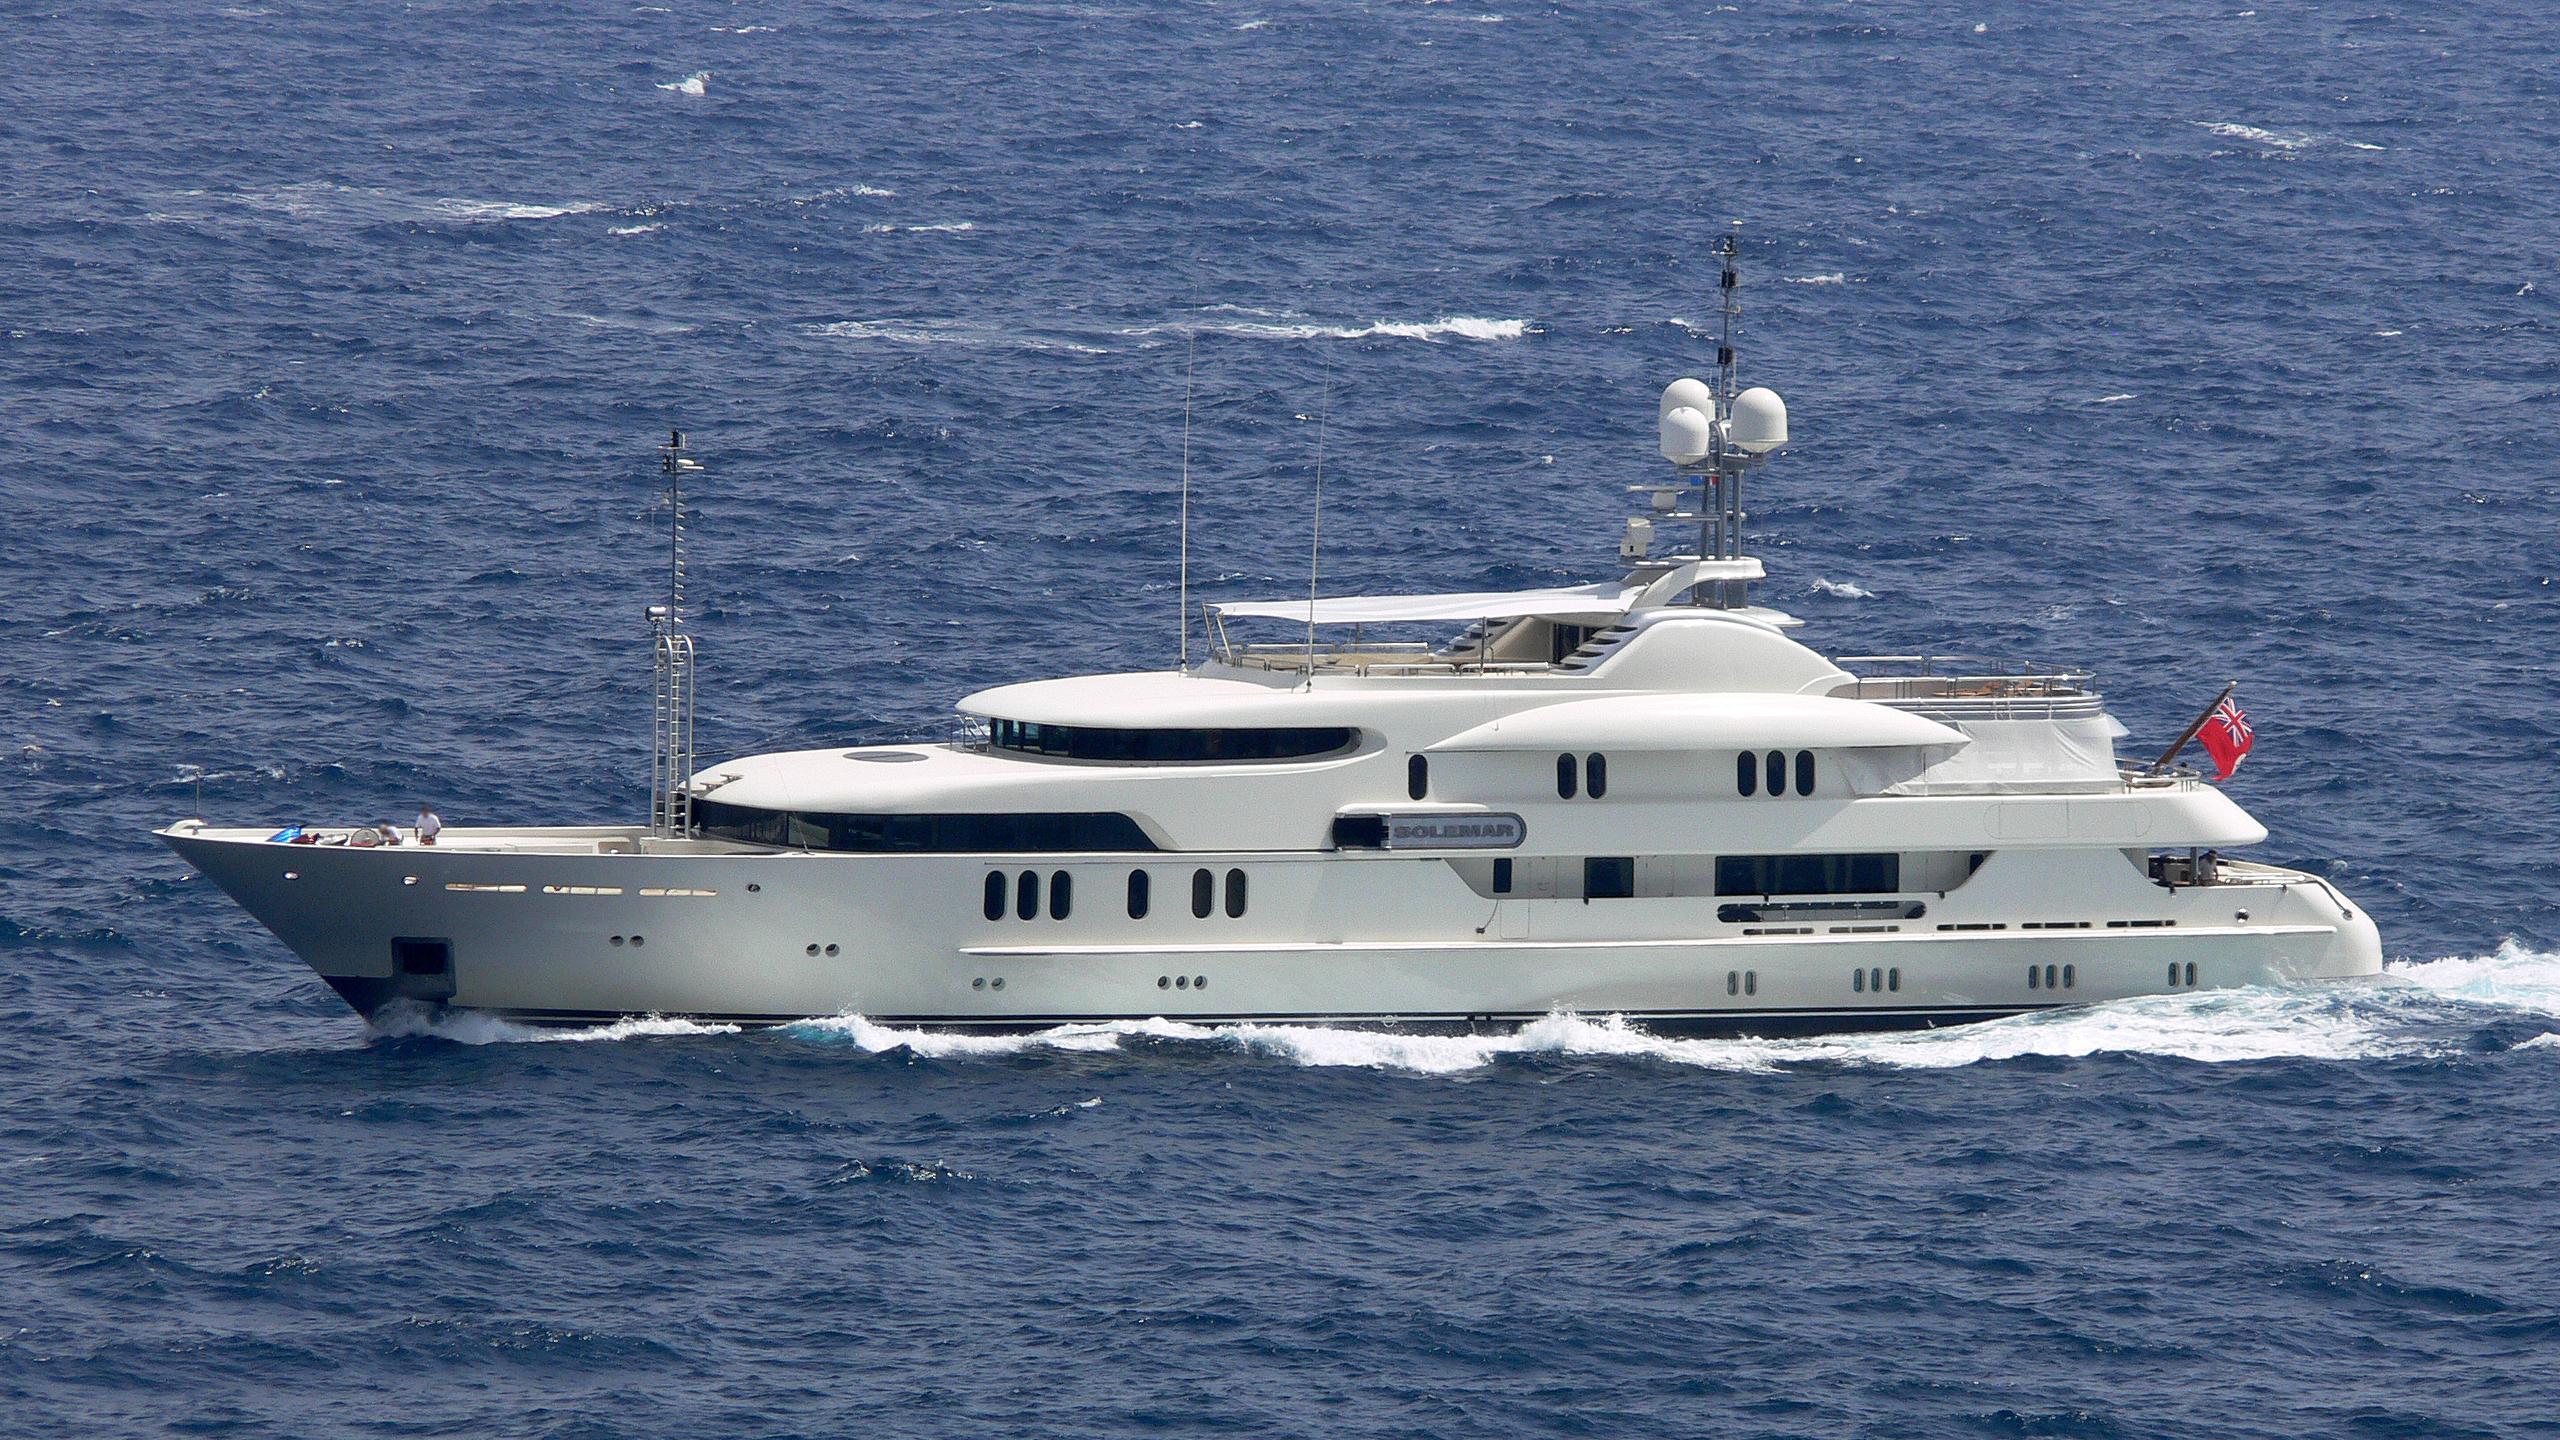 calypso-solemar-motor-yacht-amels-2003-61m-profile